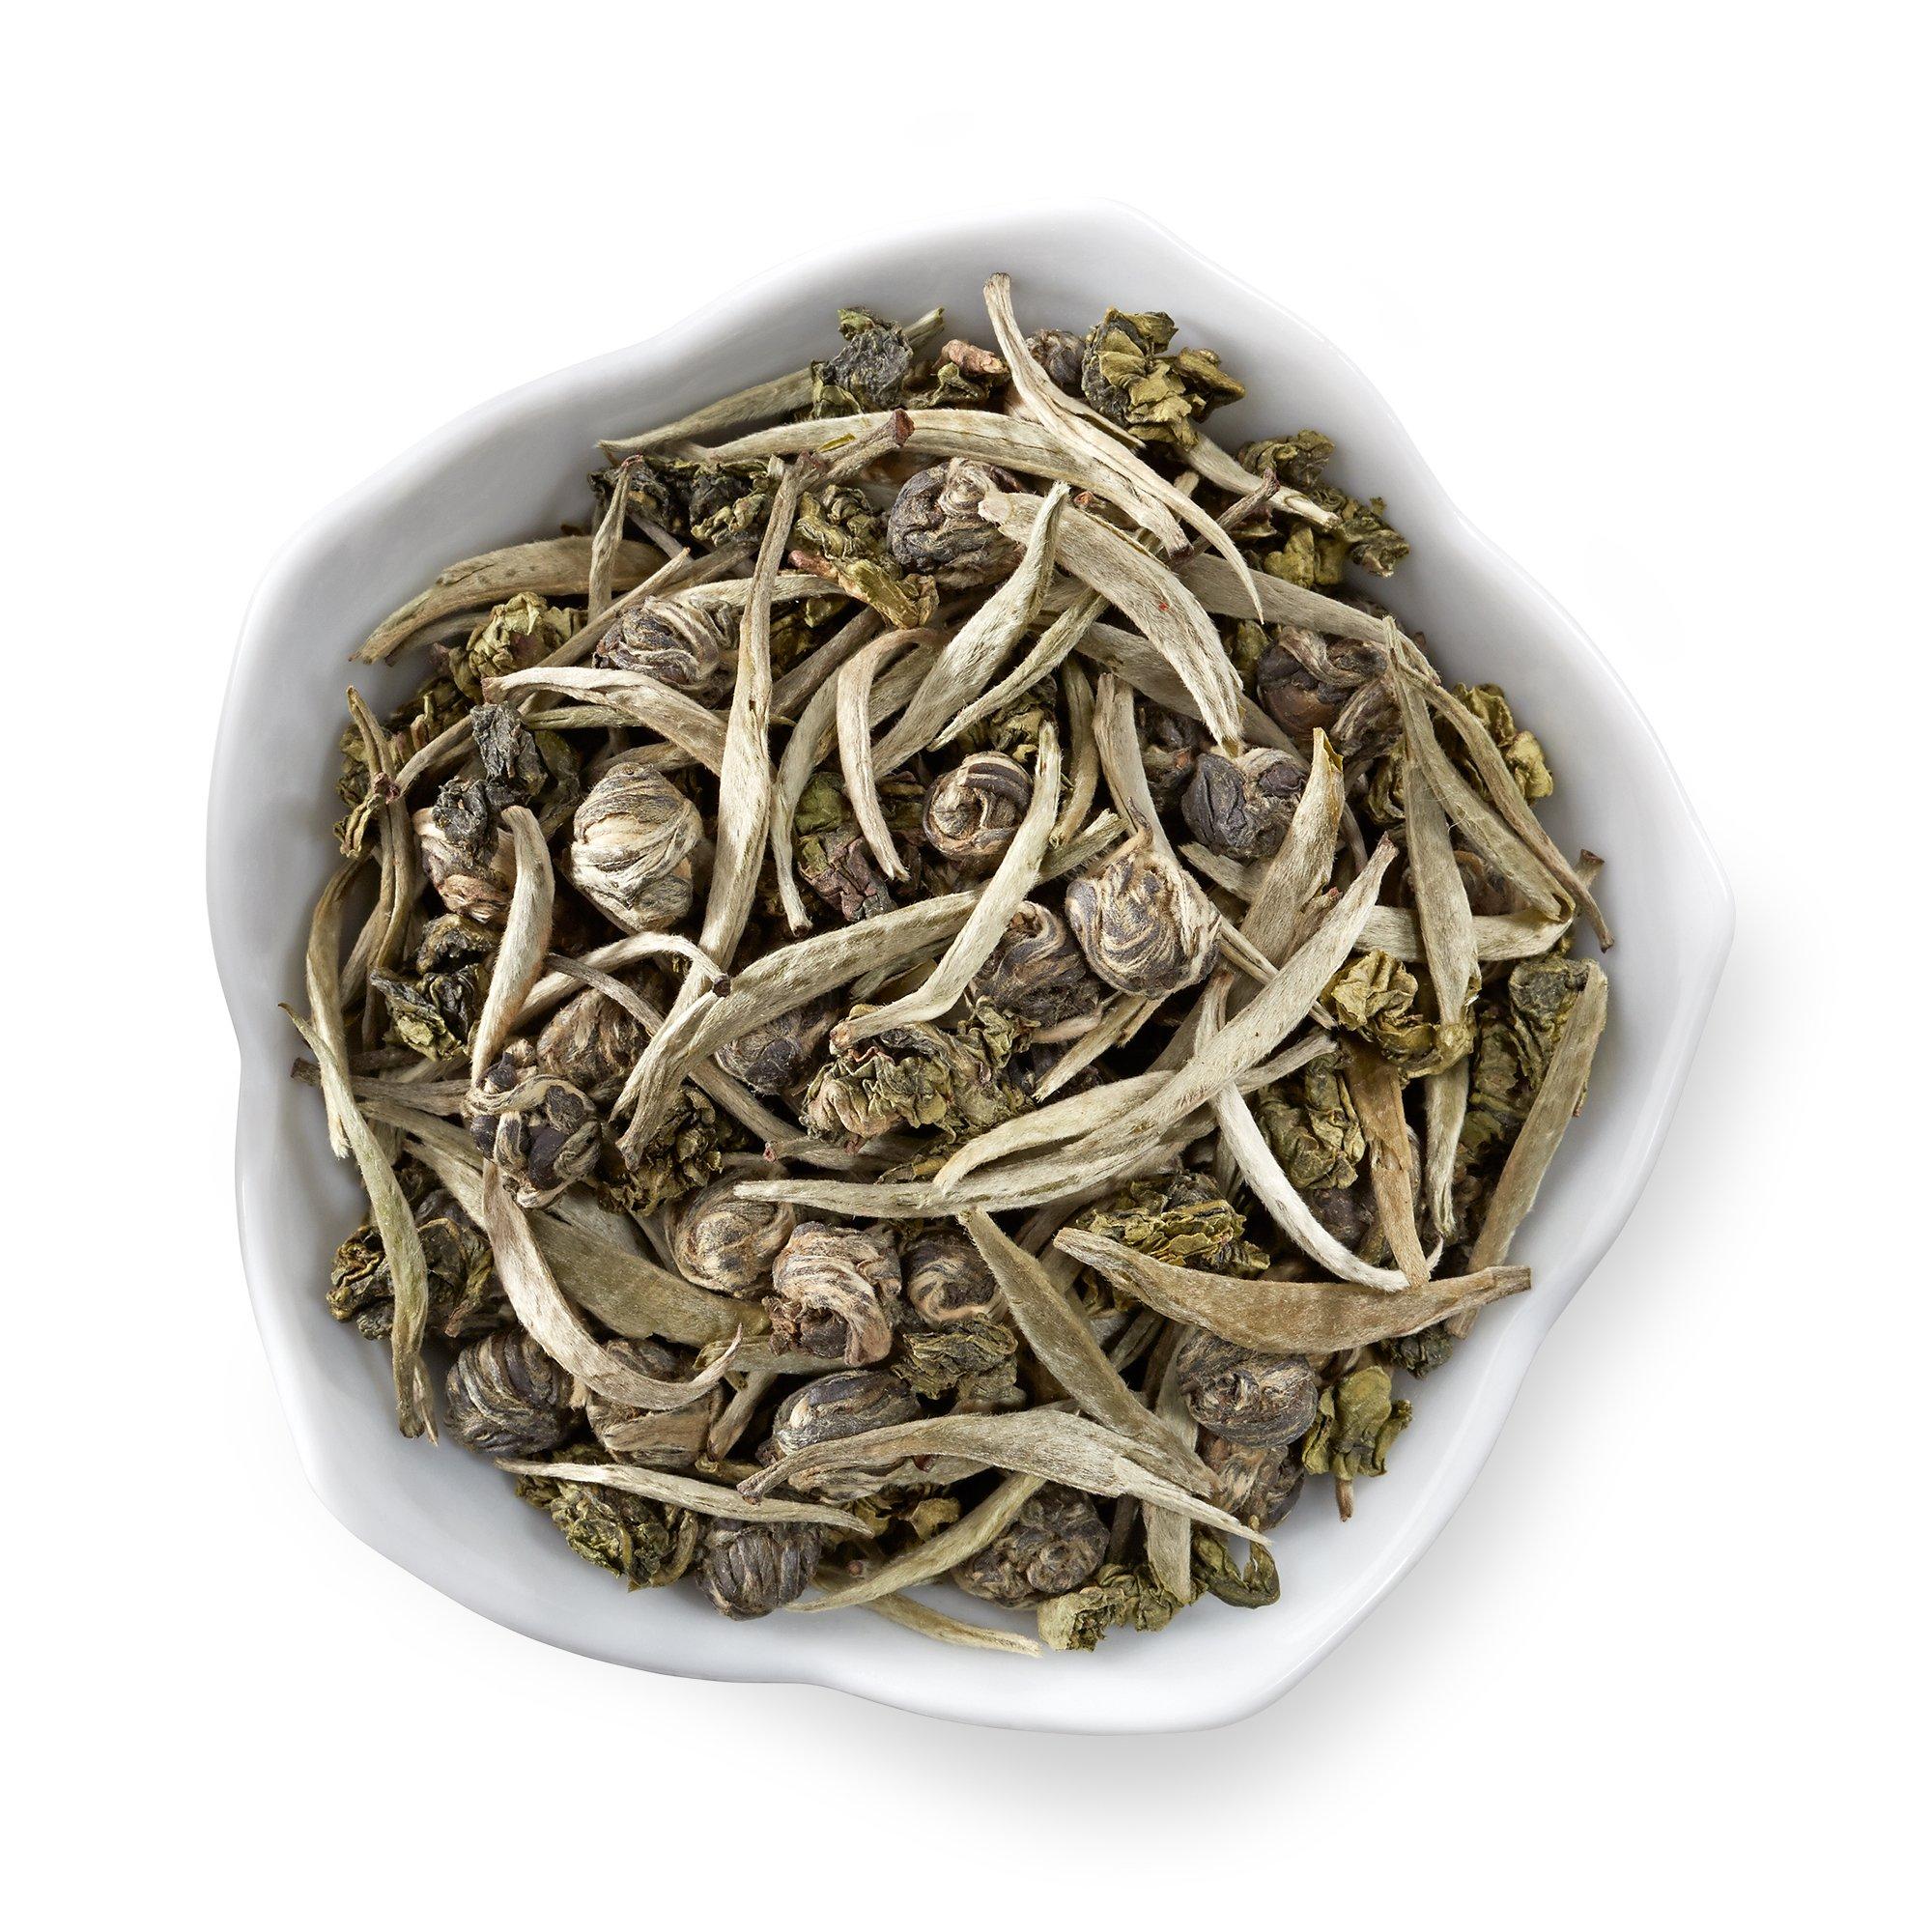 Body + MindTM White Tea by Teavana